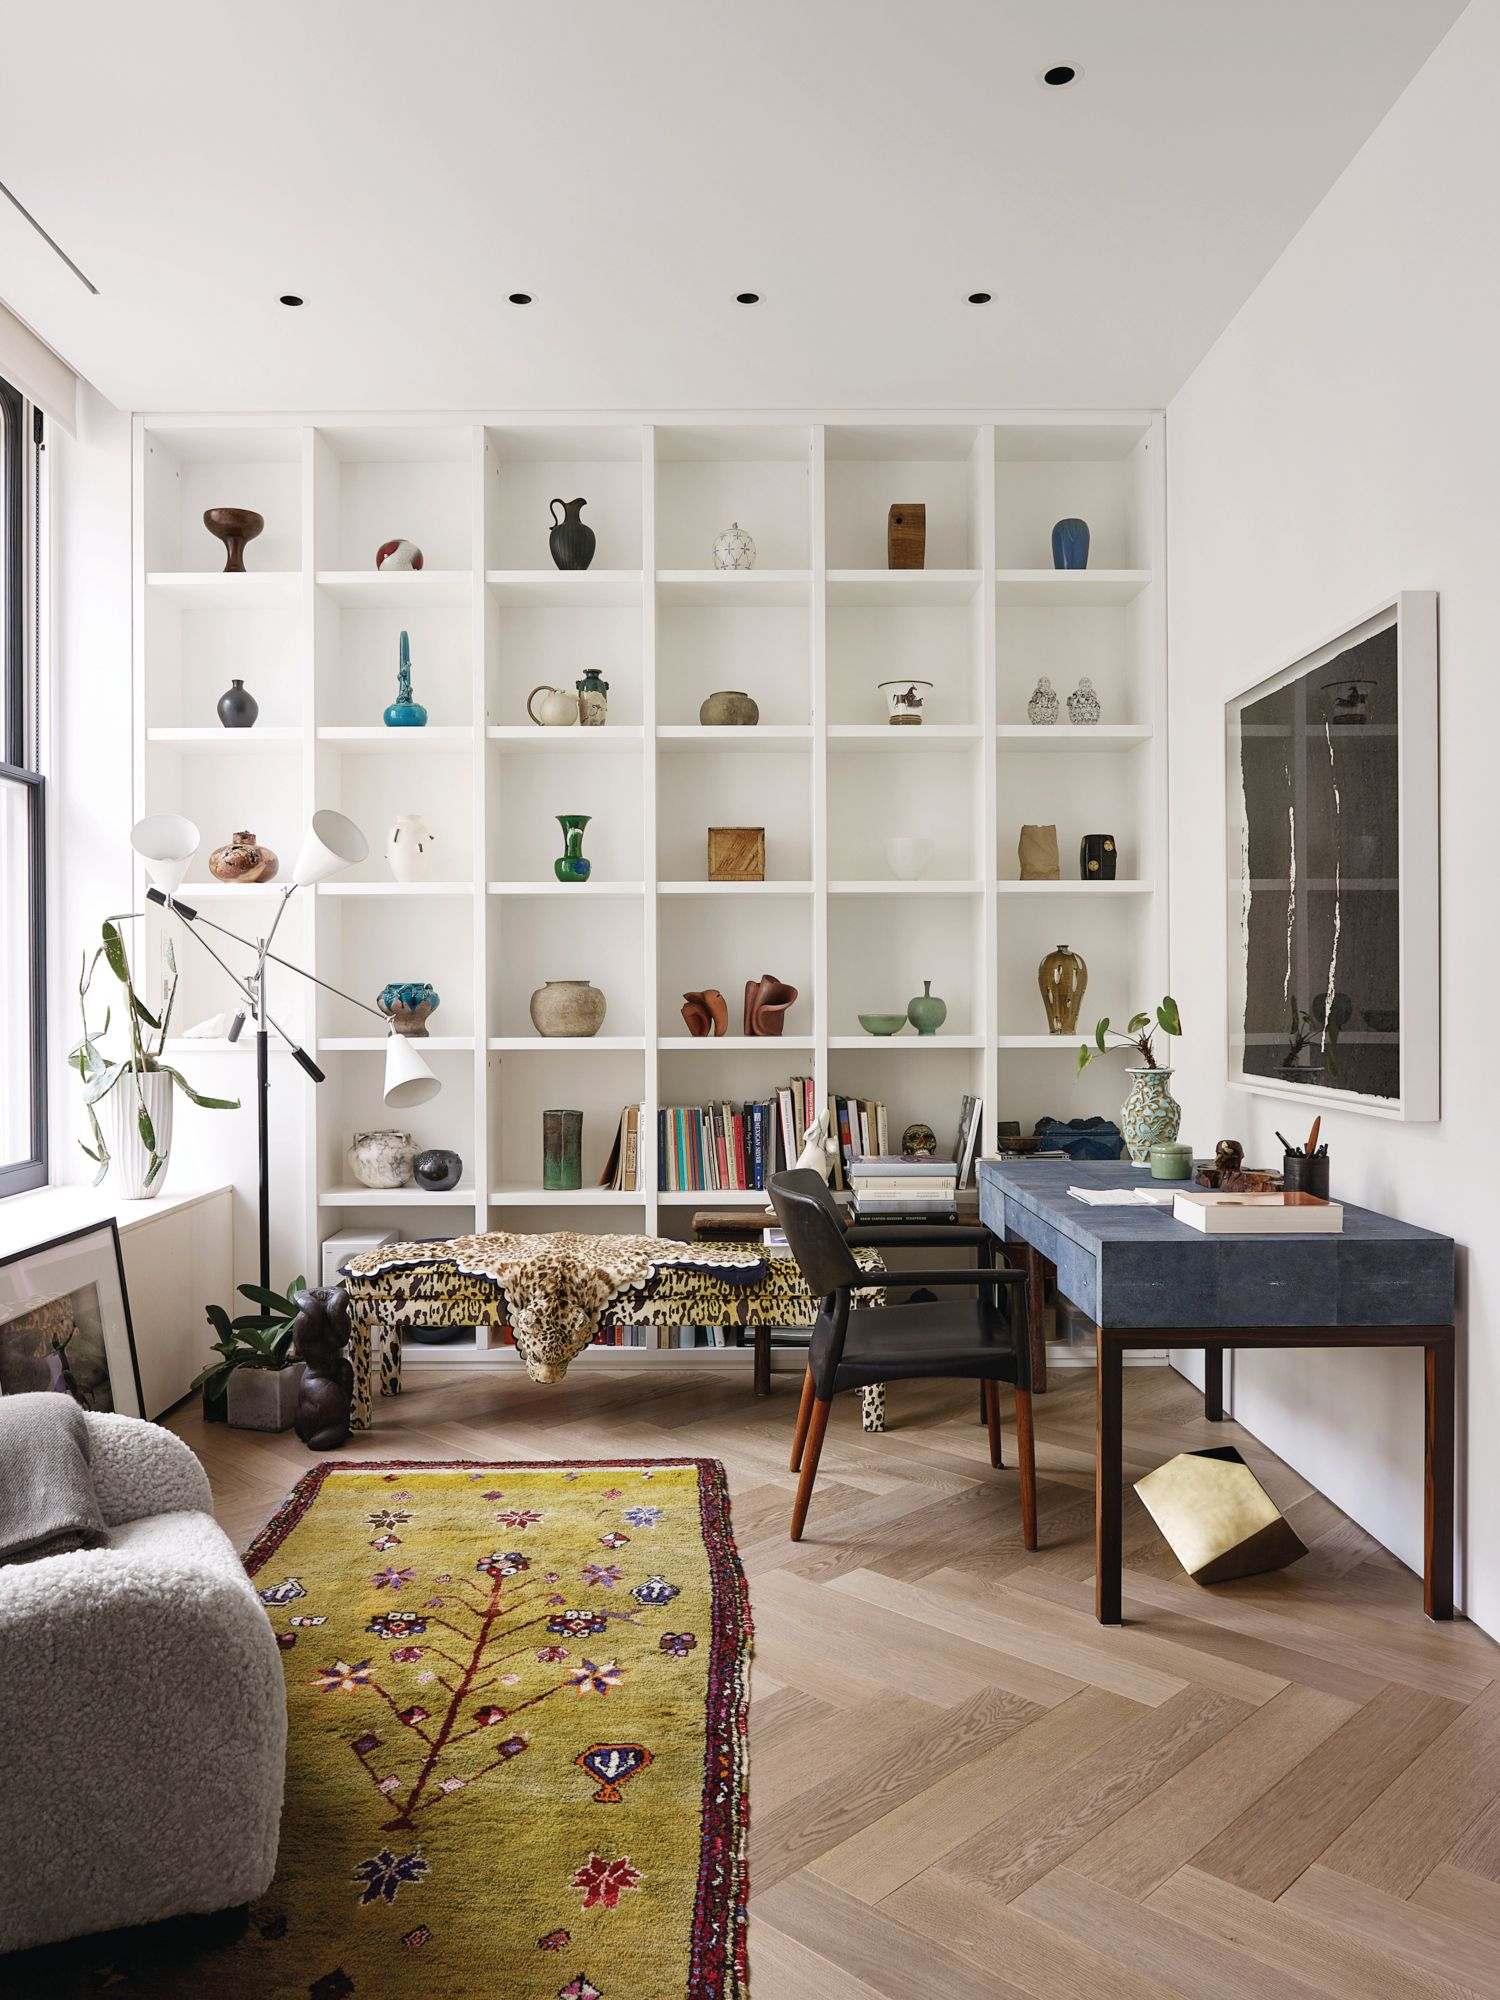 時裝設計師 Phillip Lim 的家宛如居家工作的夢想地點。(Photo: Wichmann + Bendtsen for Tatler Hong Kong)